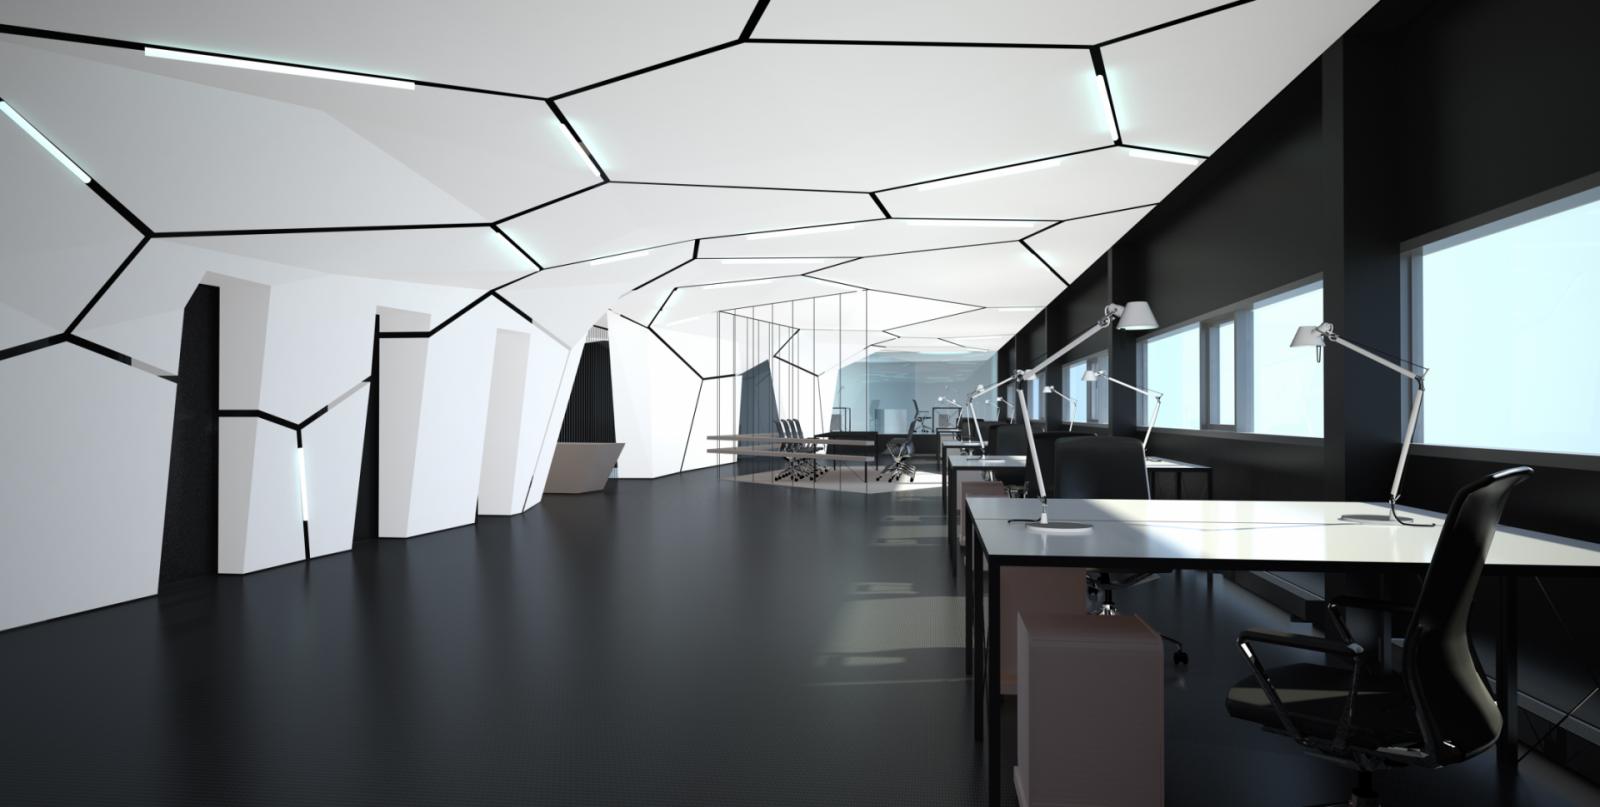 plafond tendu sarl michelin barrisol chalon sur sa ne mat riaux pinterest plafond. Black Bedroom Furniture Sets. Home Design Ideas